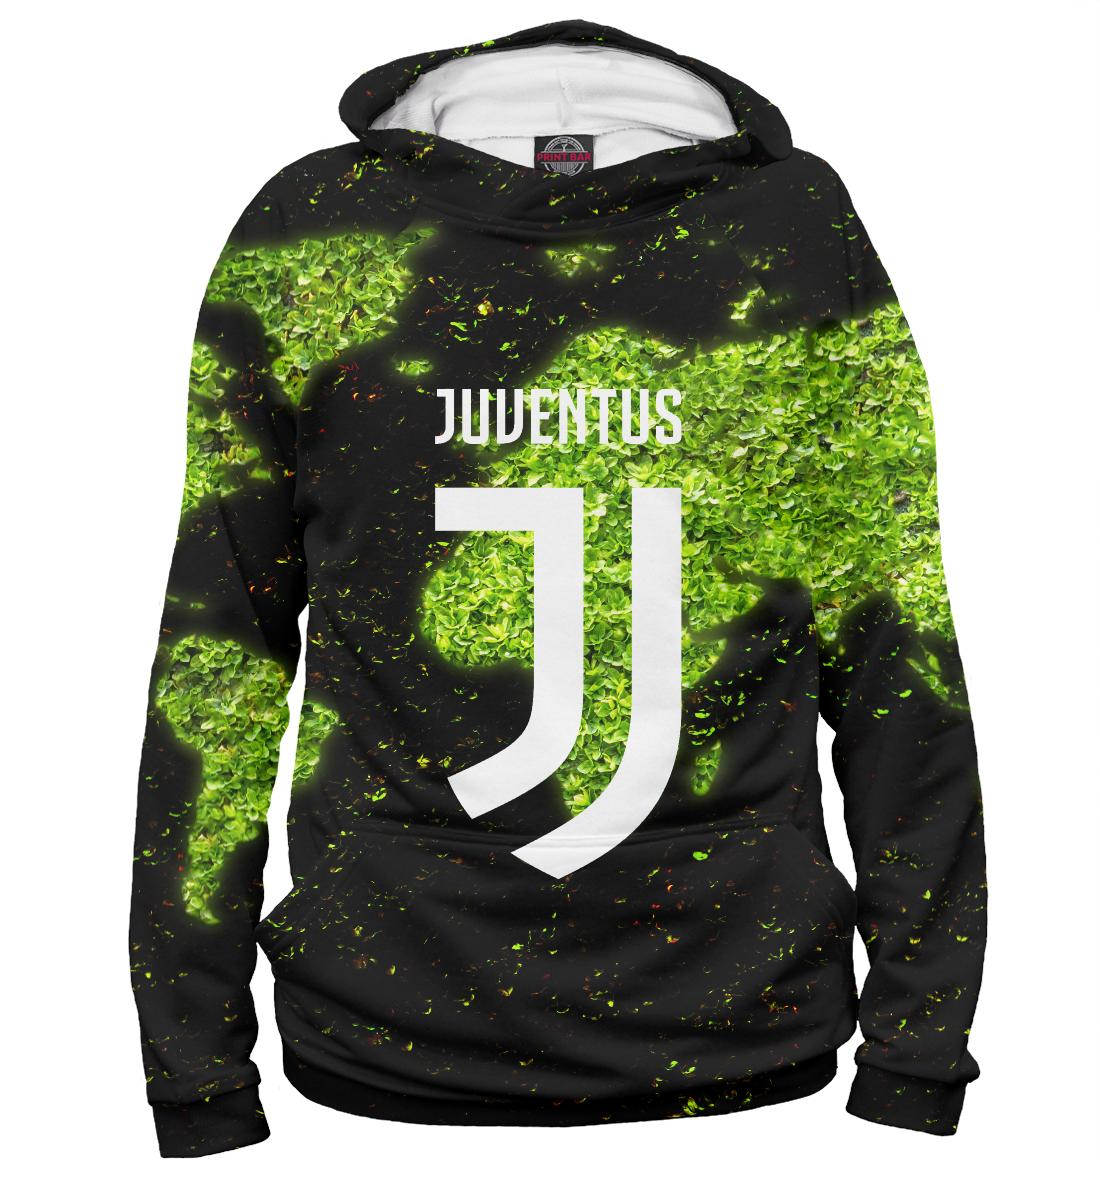 Juventus in World, Printbar, Худи, JUV-682483-hud-2  - купить со скидкой